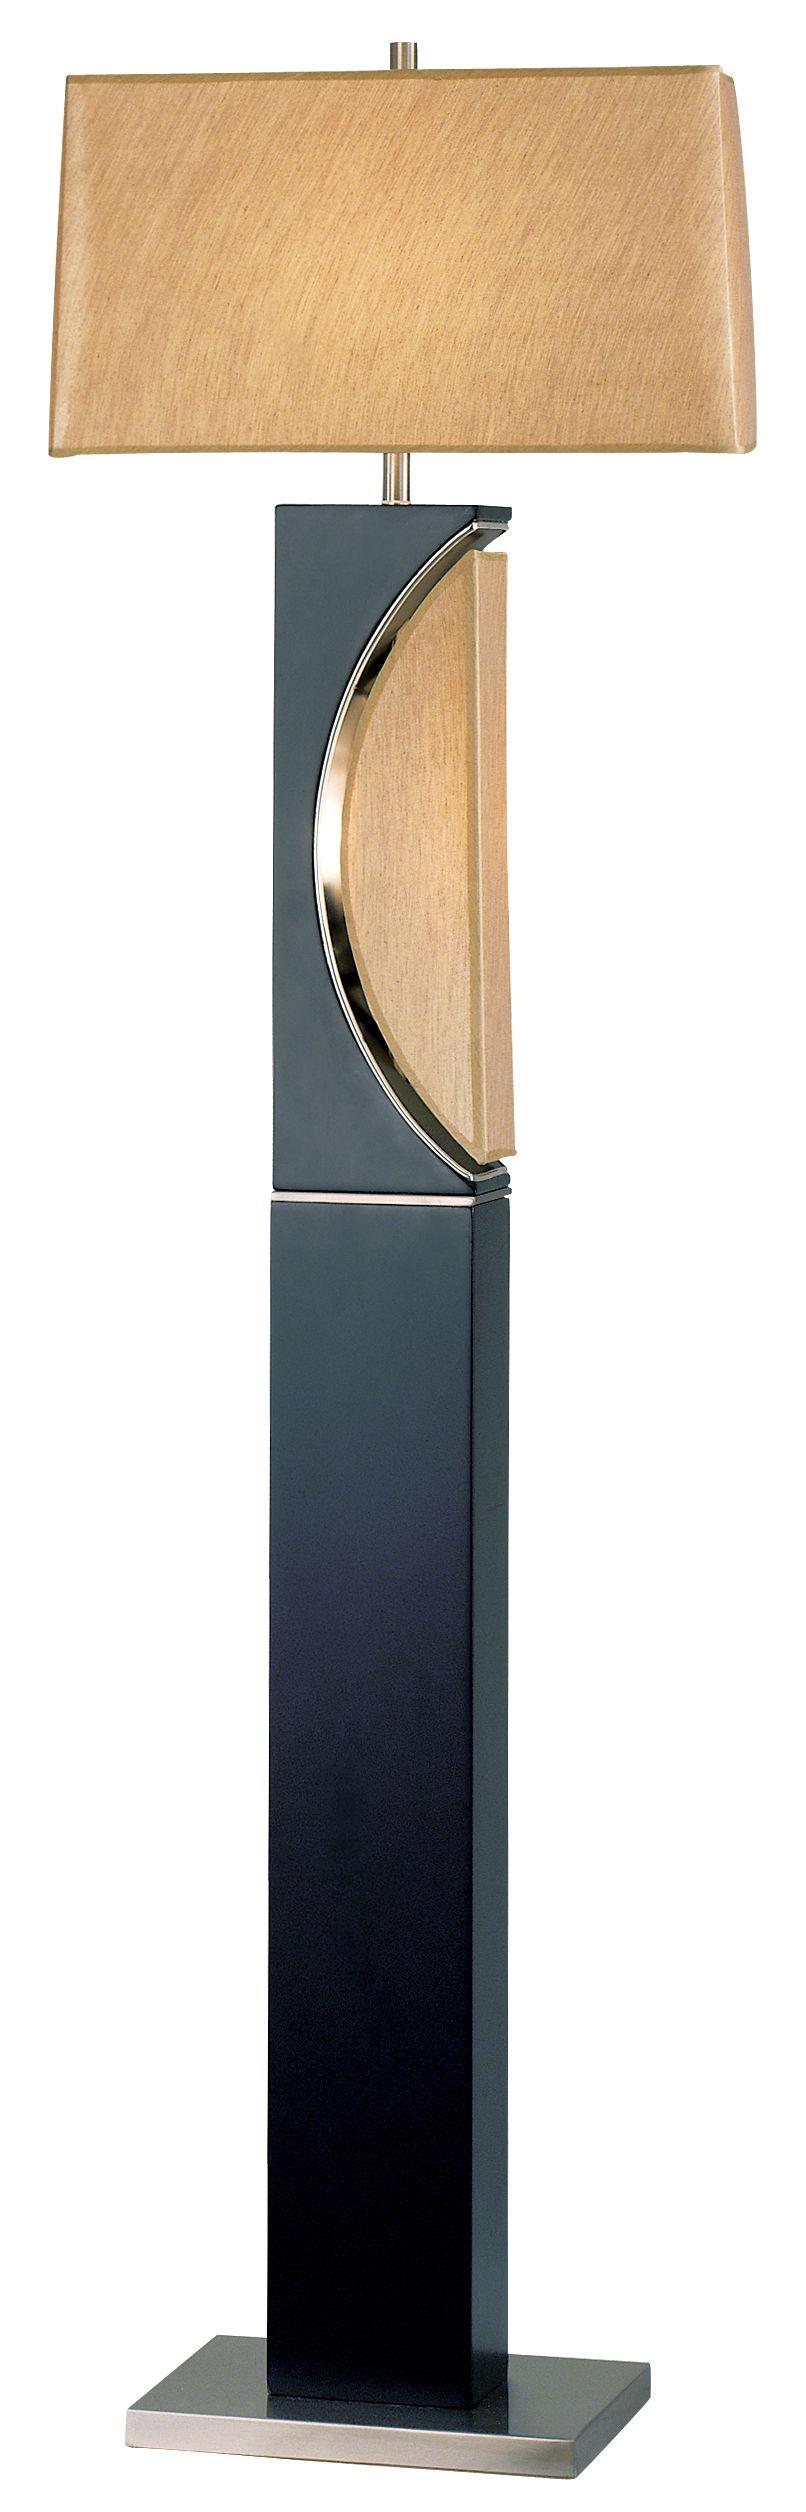 Nova Half Moon Wood Contemporary Floor Lamp Eurostylelighting